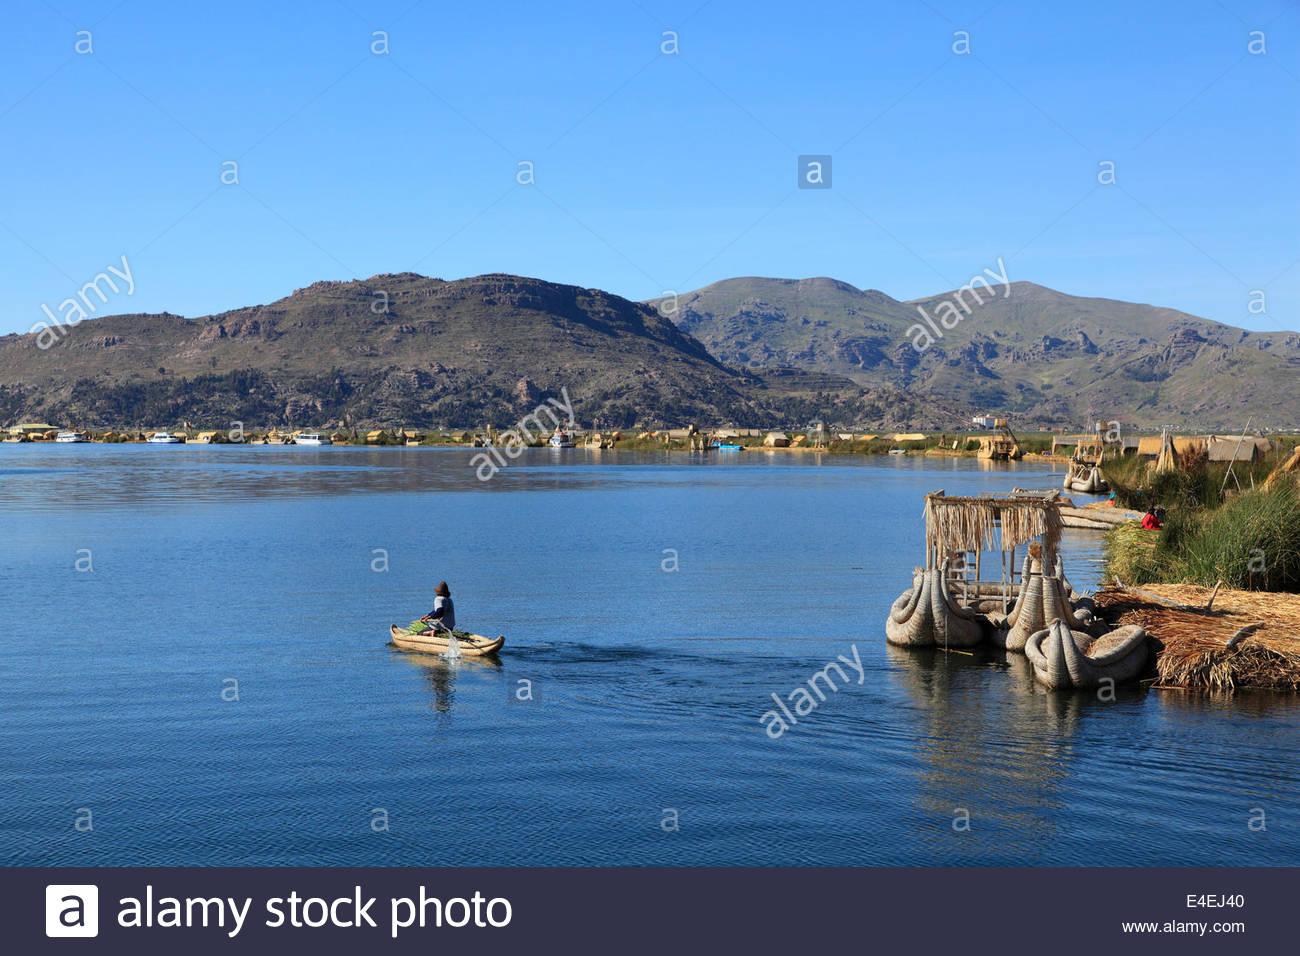 Canoe Uros Island Lago Titicaca Stock Photos & Canoe Uros Island ...